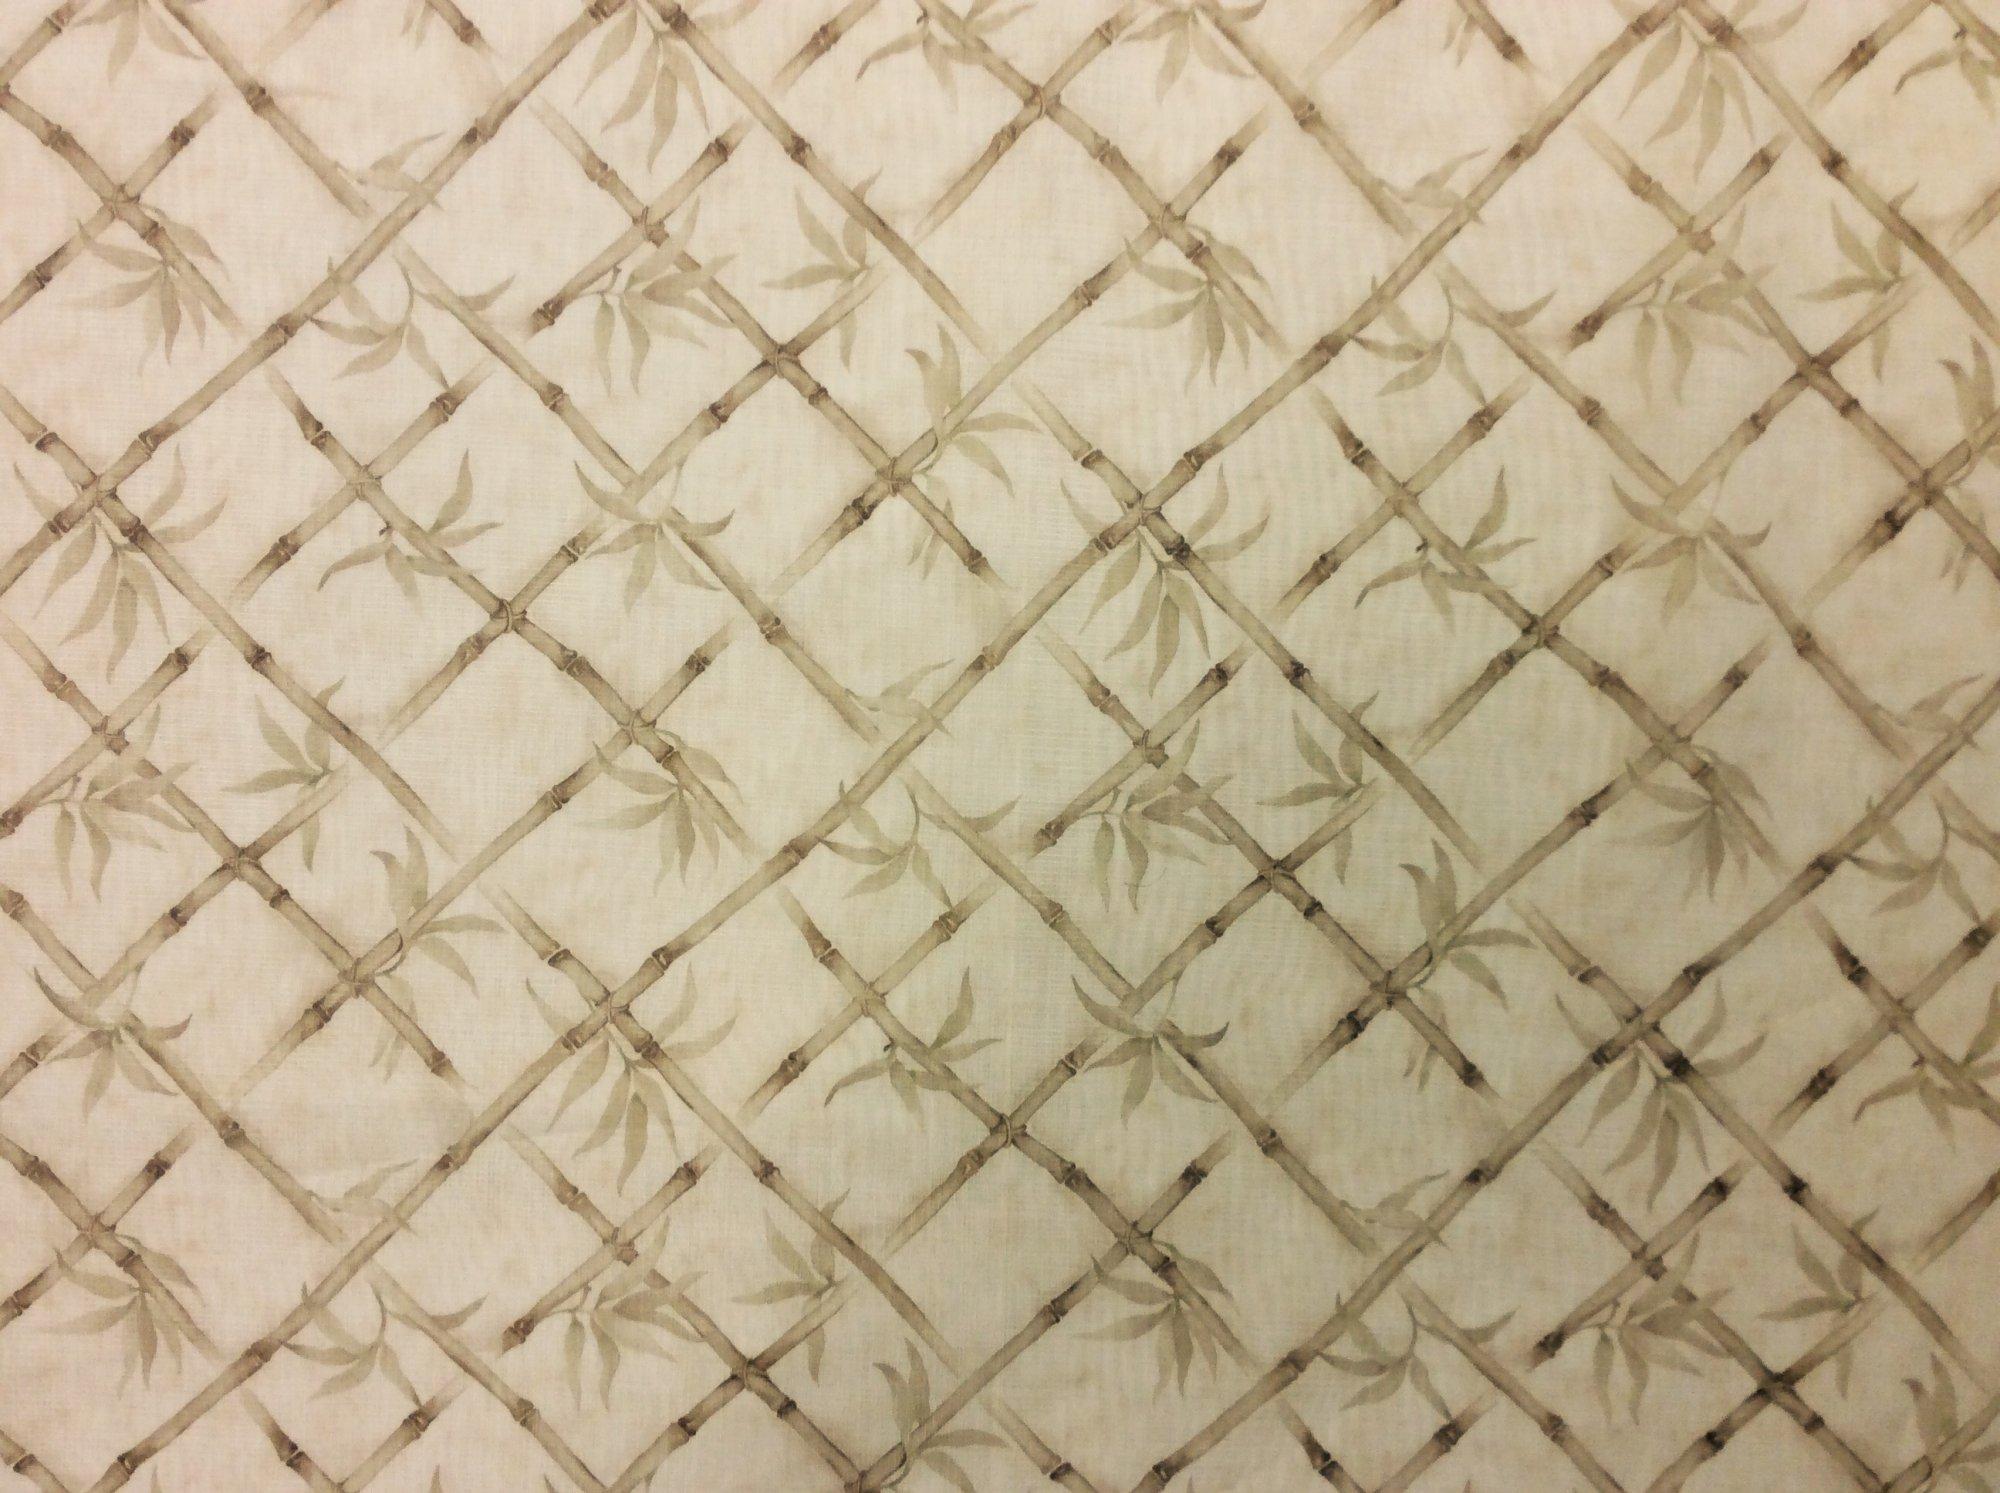 Bamboo Print Window Sheer Polyester Organza Apparel Drapery Fabric B34